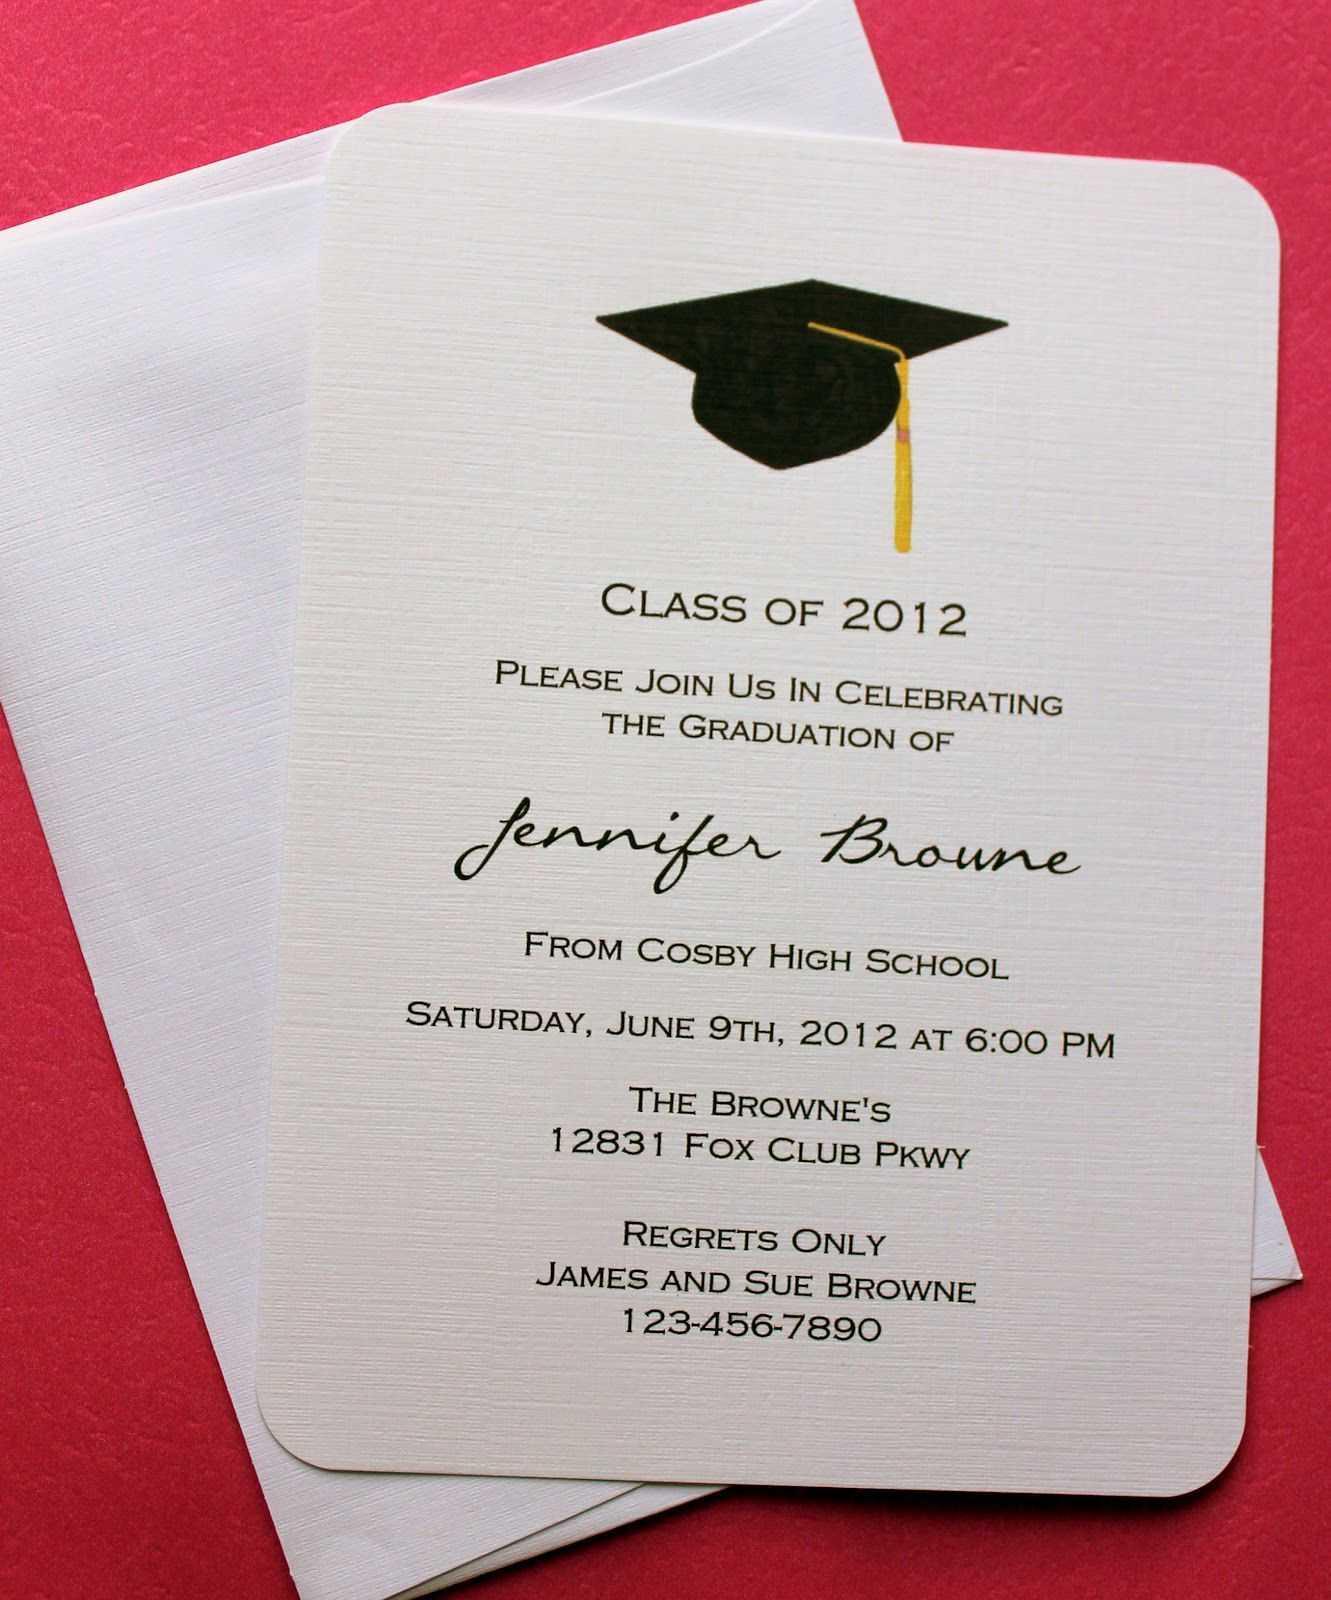 Graduation Invitation Templates Microsoft Word | Graduation Throughout Graduation Invitation Templates Microsoft Word